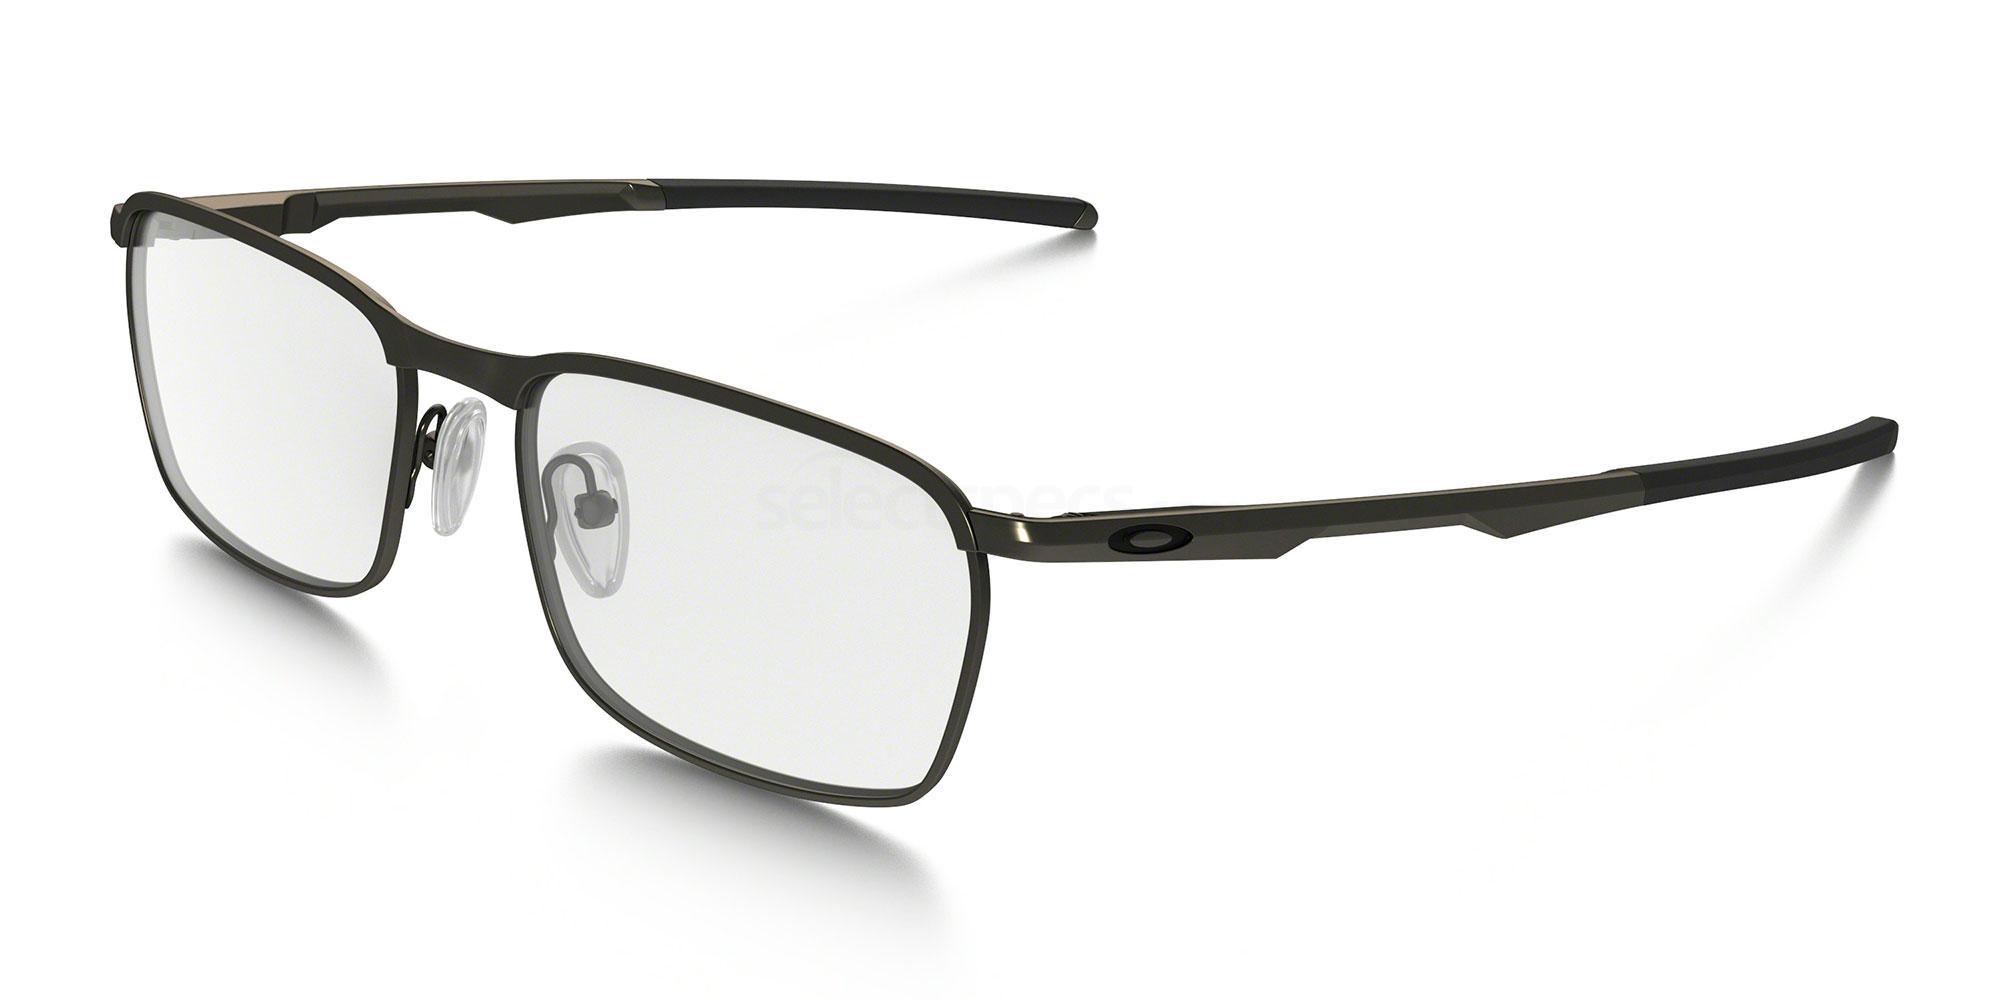 318602 OX3186 CONDUCTOR Glasses, Oakley